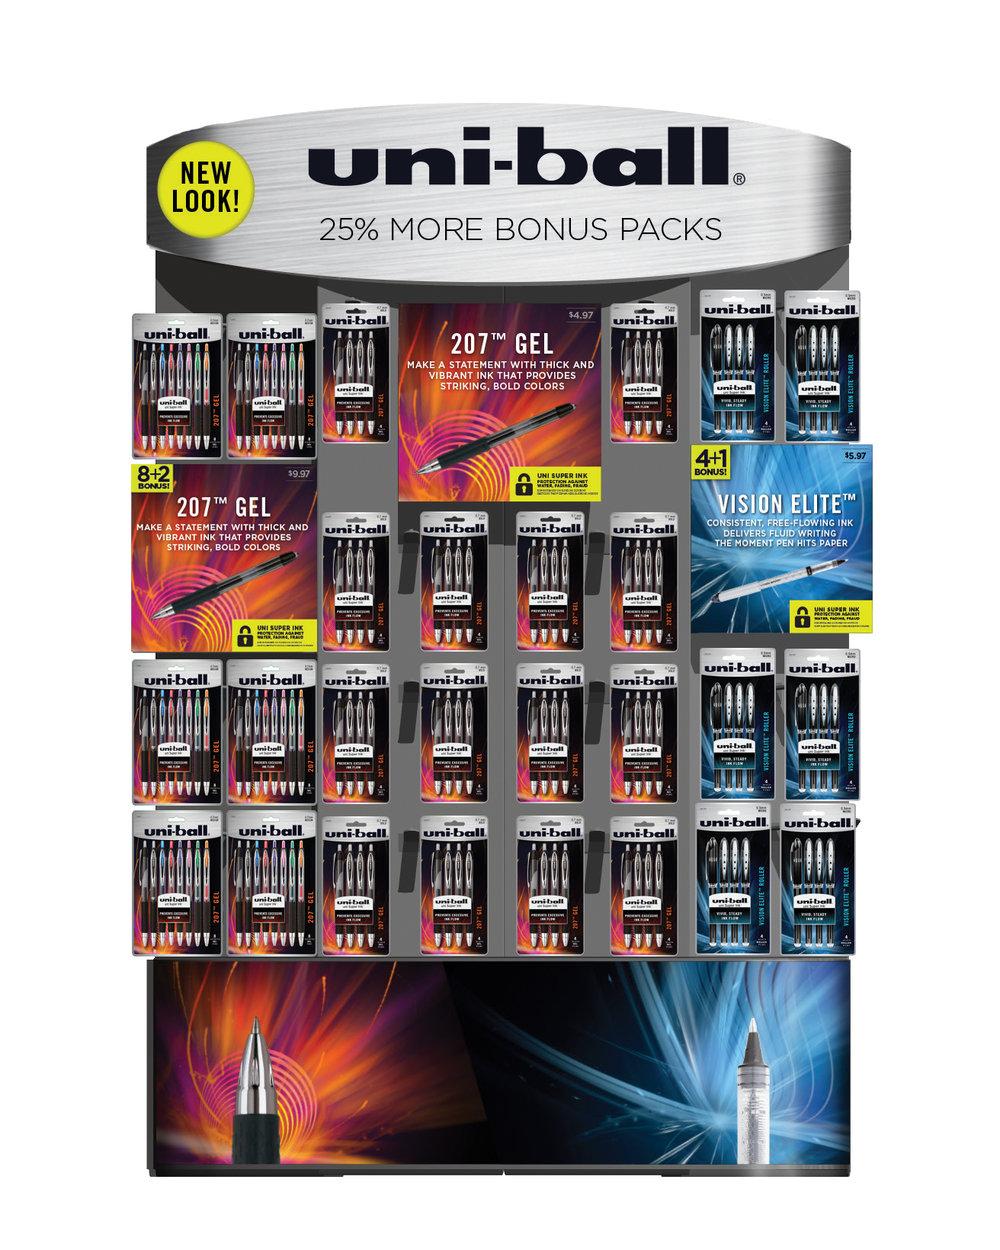 uniball_display1.jpg